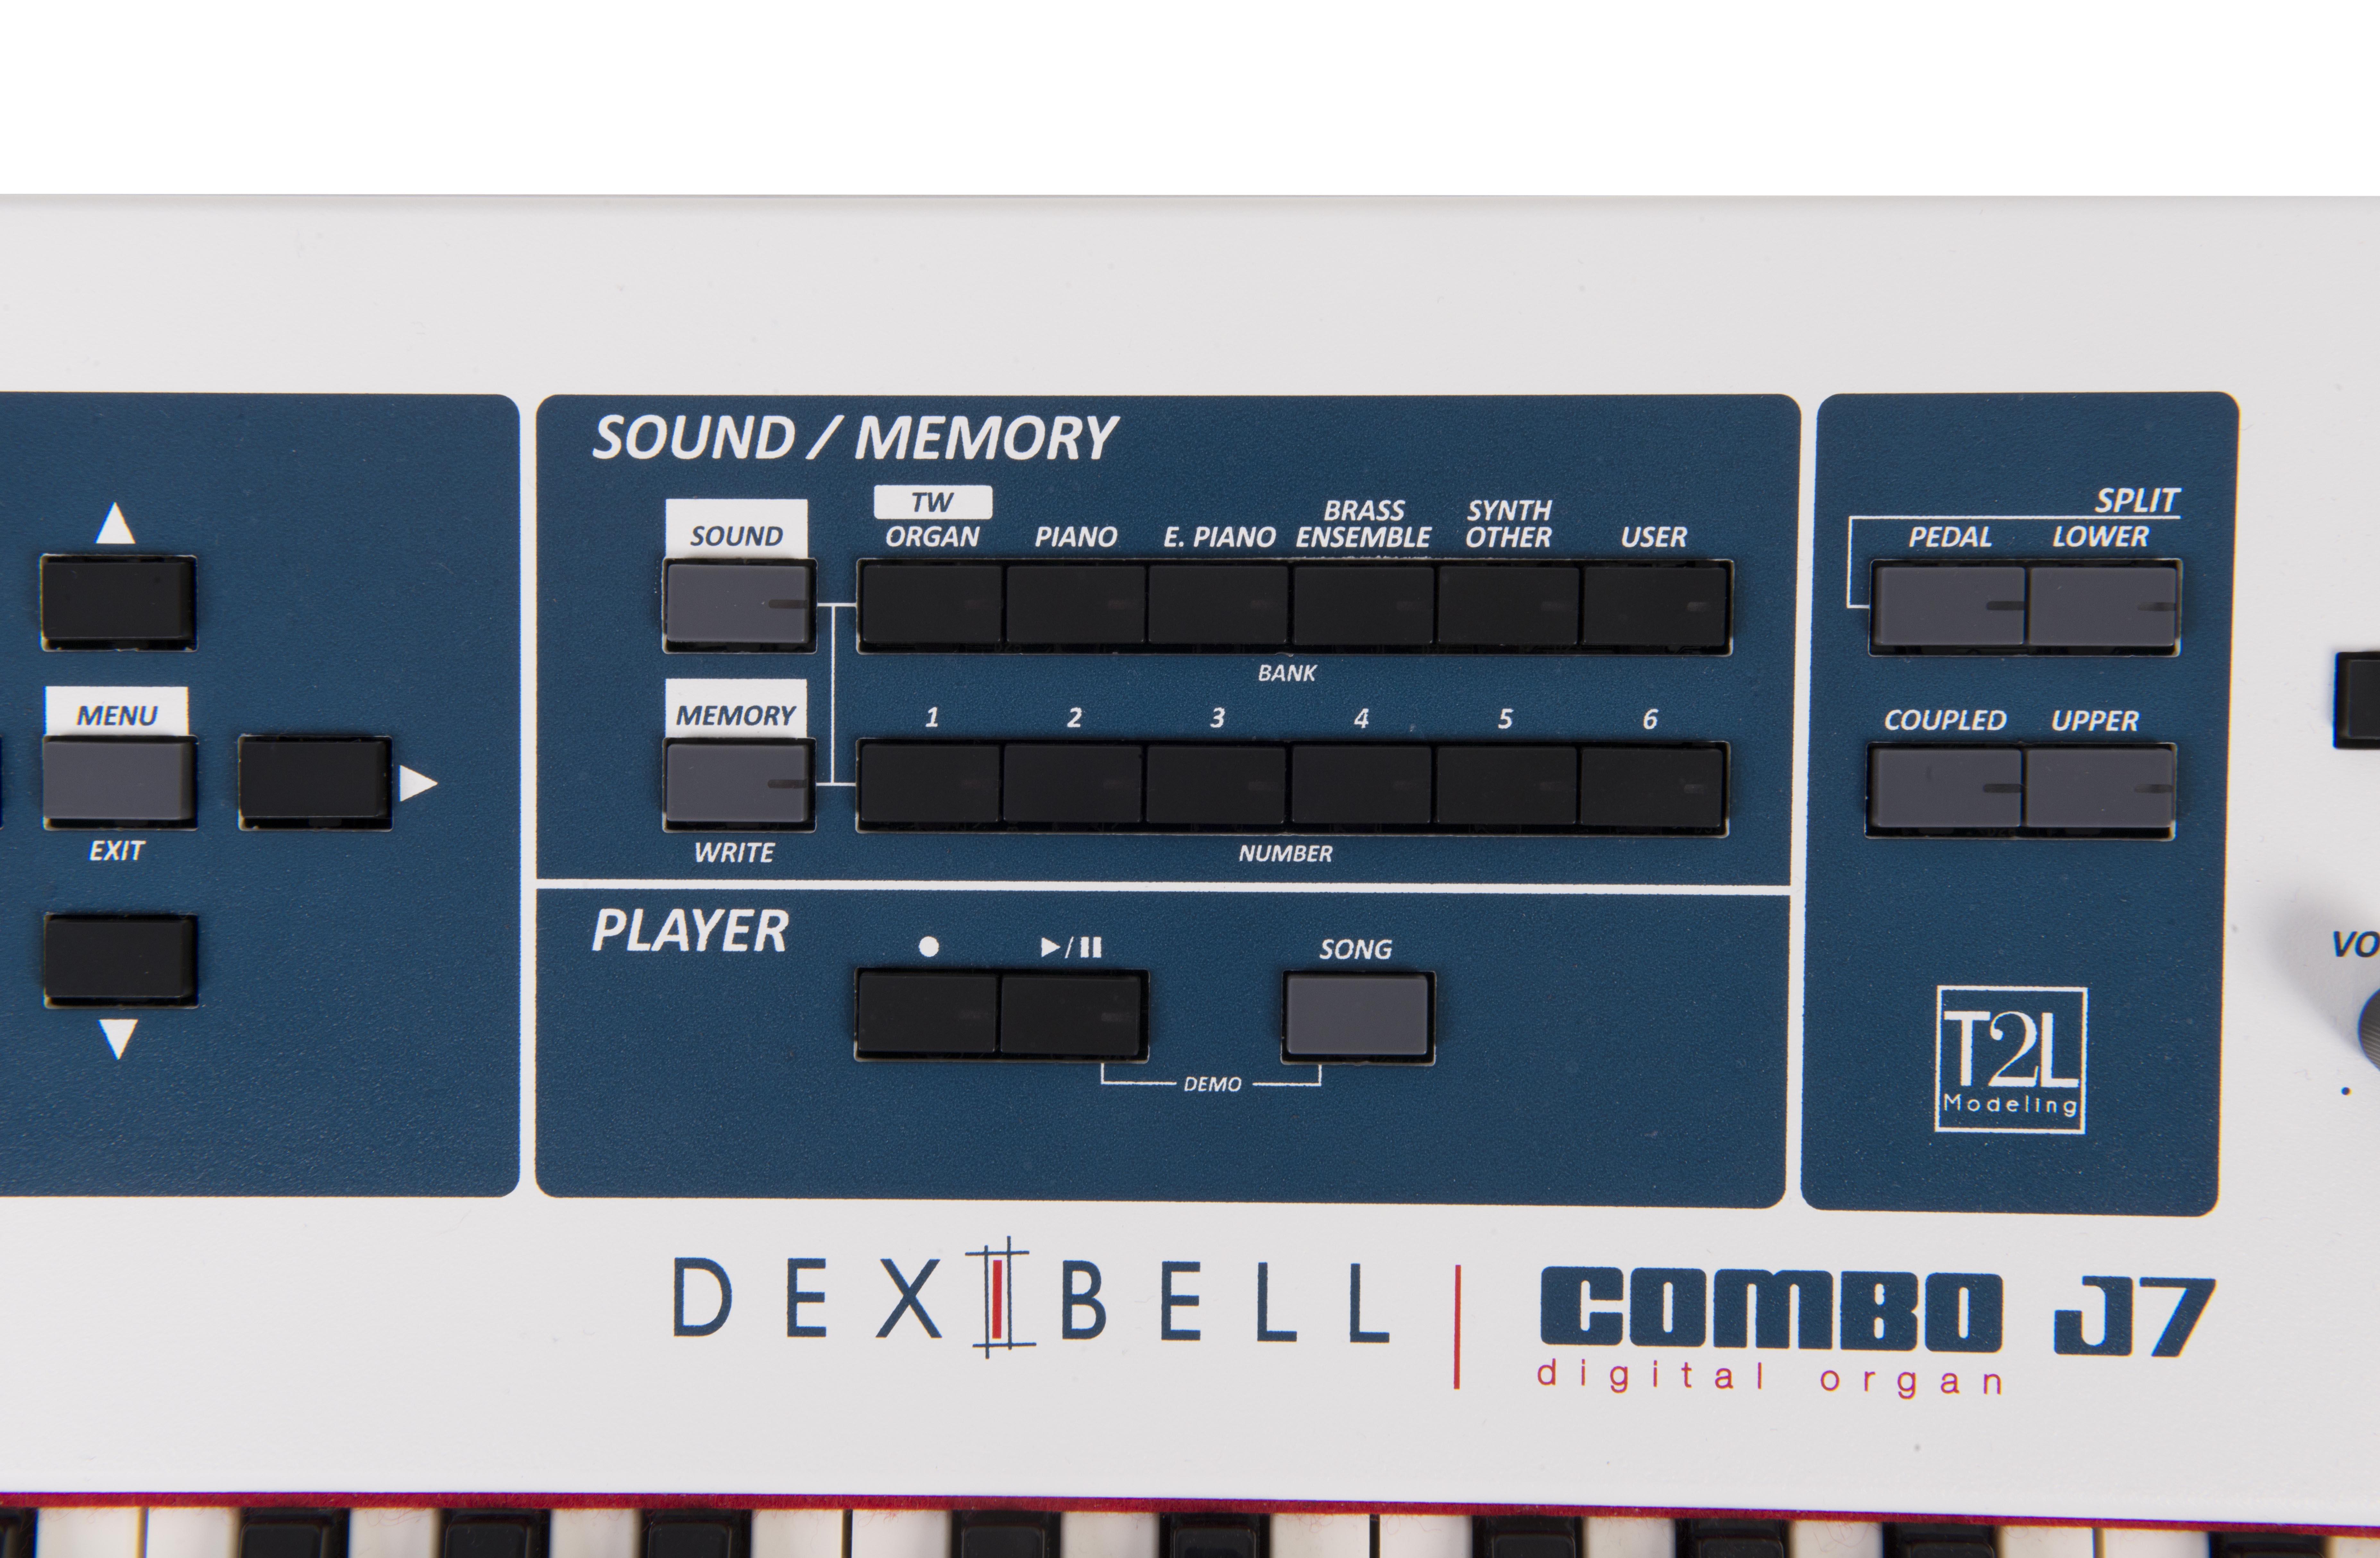 COMBO J7 (73鍵) 音色